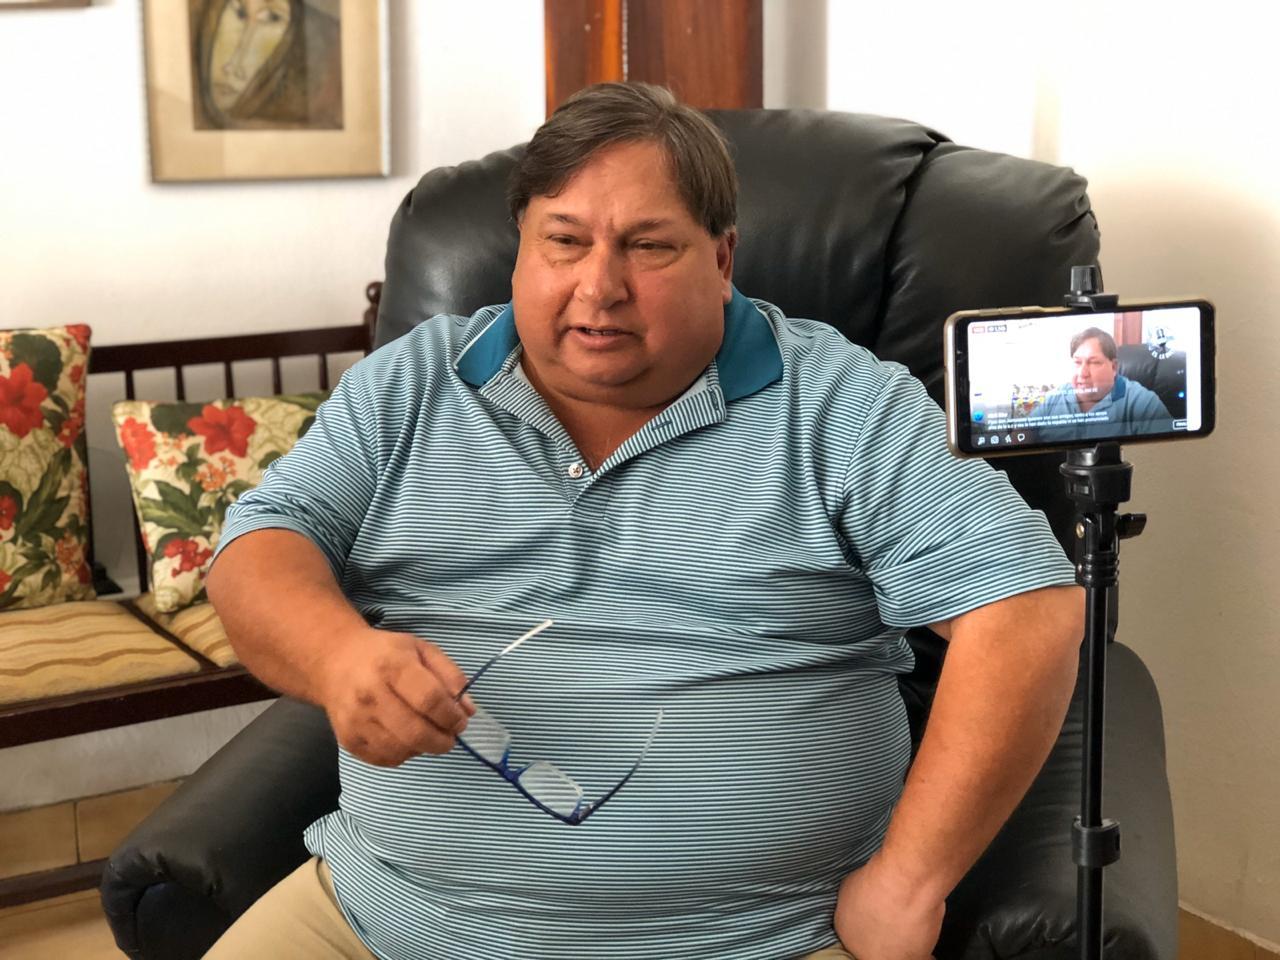 Comentarista Jaime Arellano denuncia ante la CPDH asedio policial. Foto: Donaldo Hernández/VOA